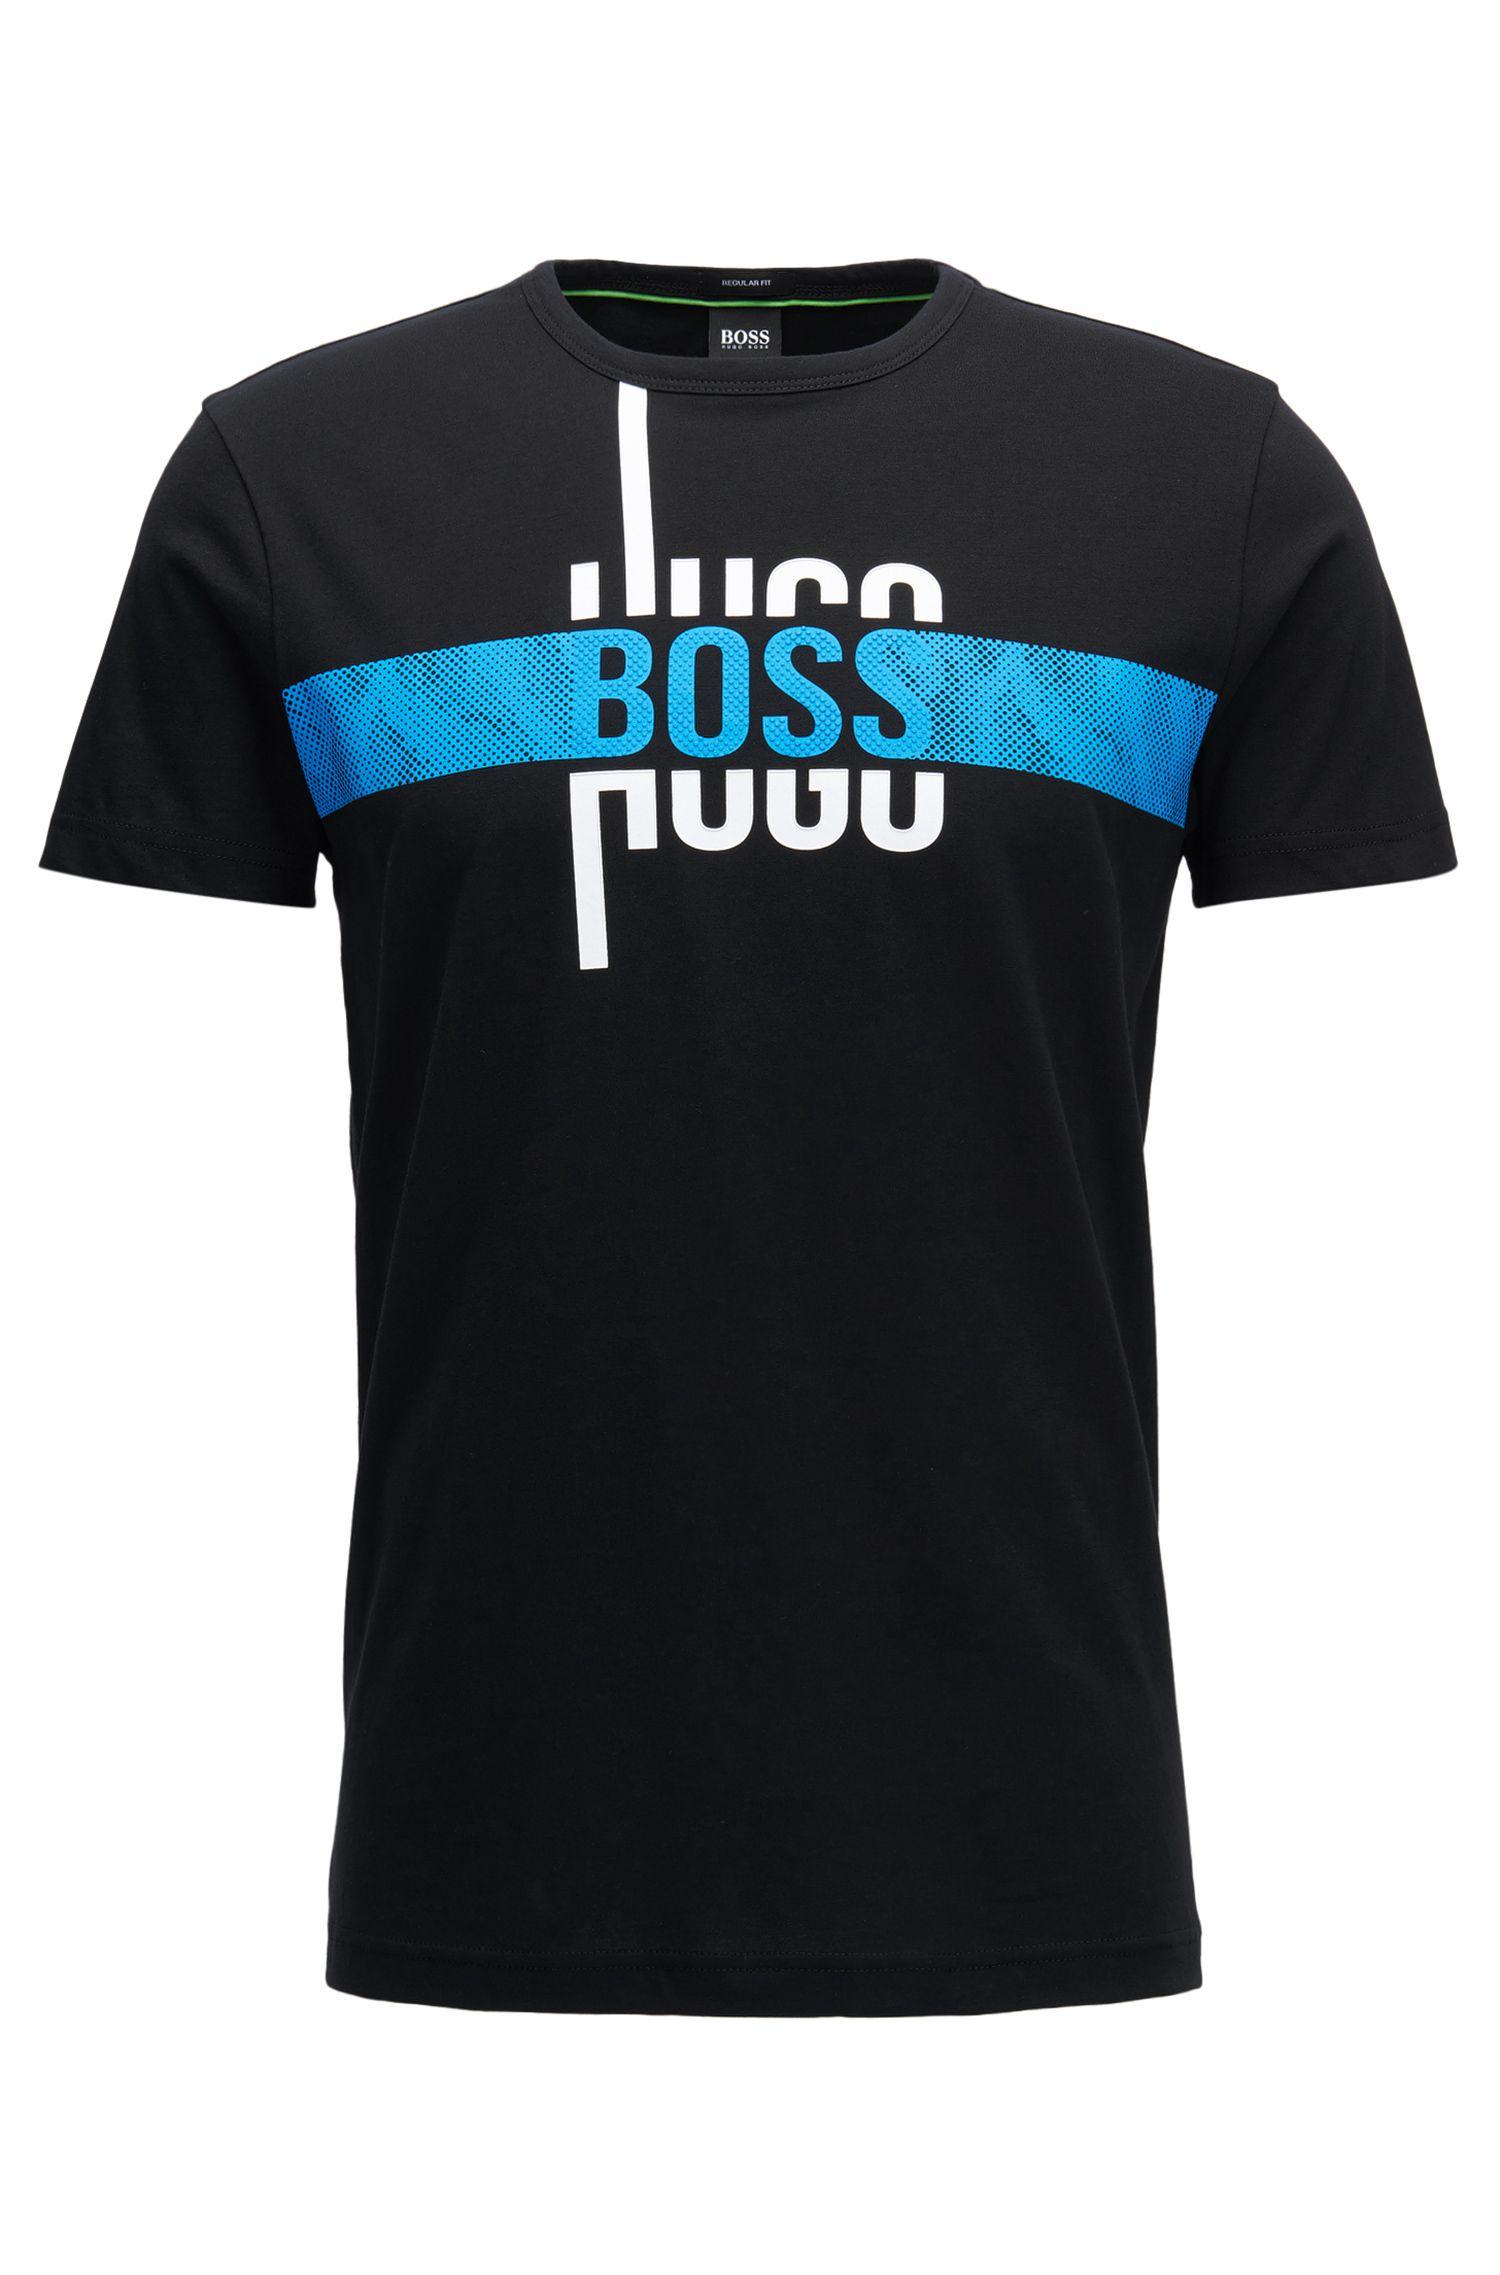 Cotton Graphic T-Shirt   Tee, Black